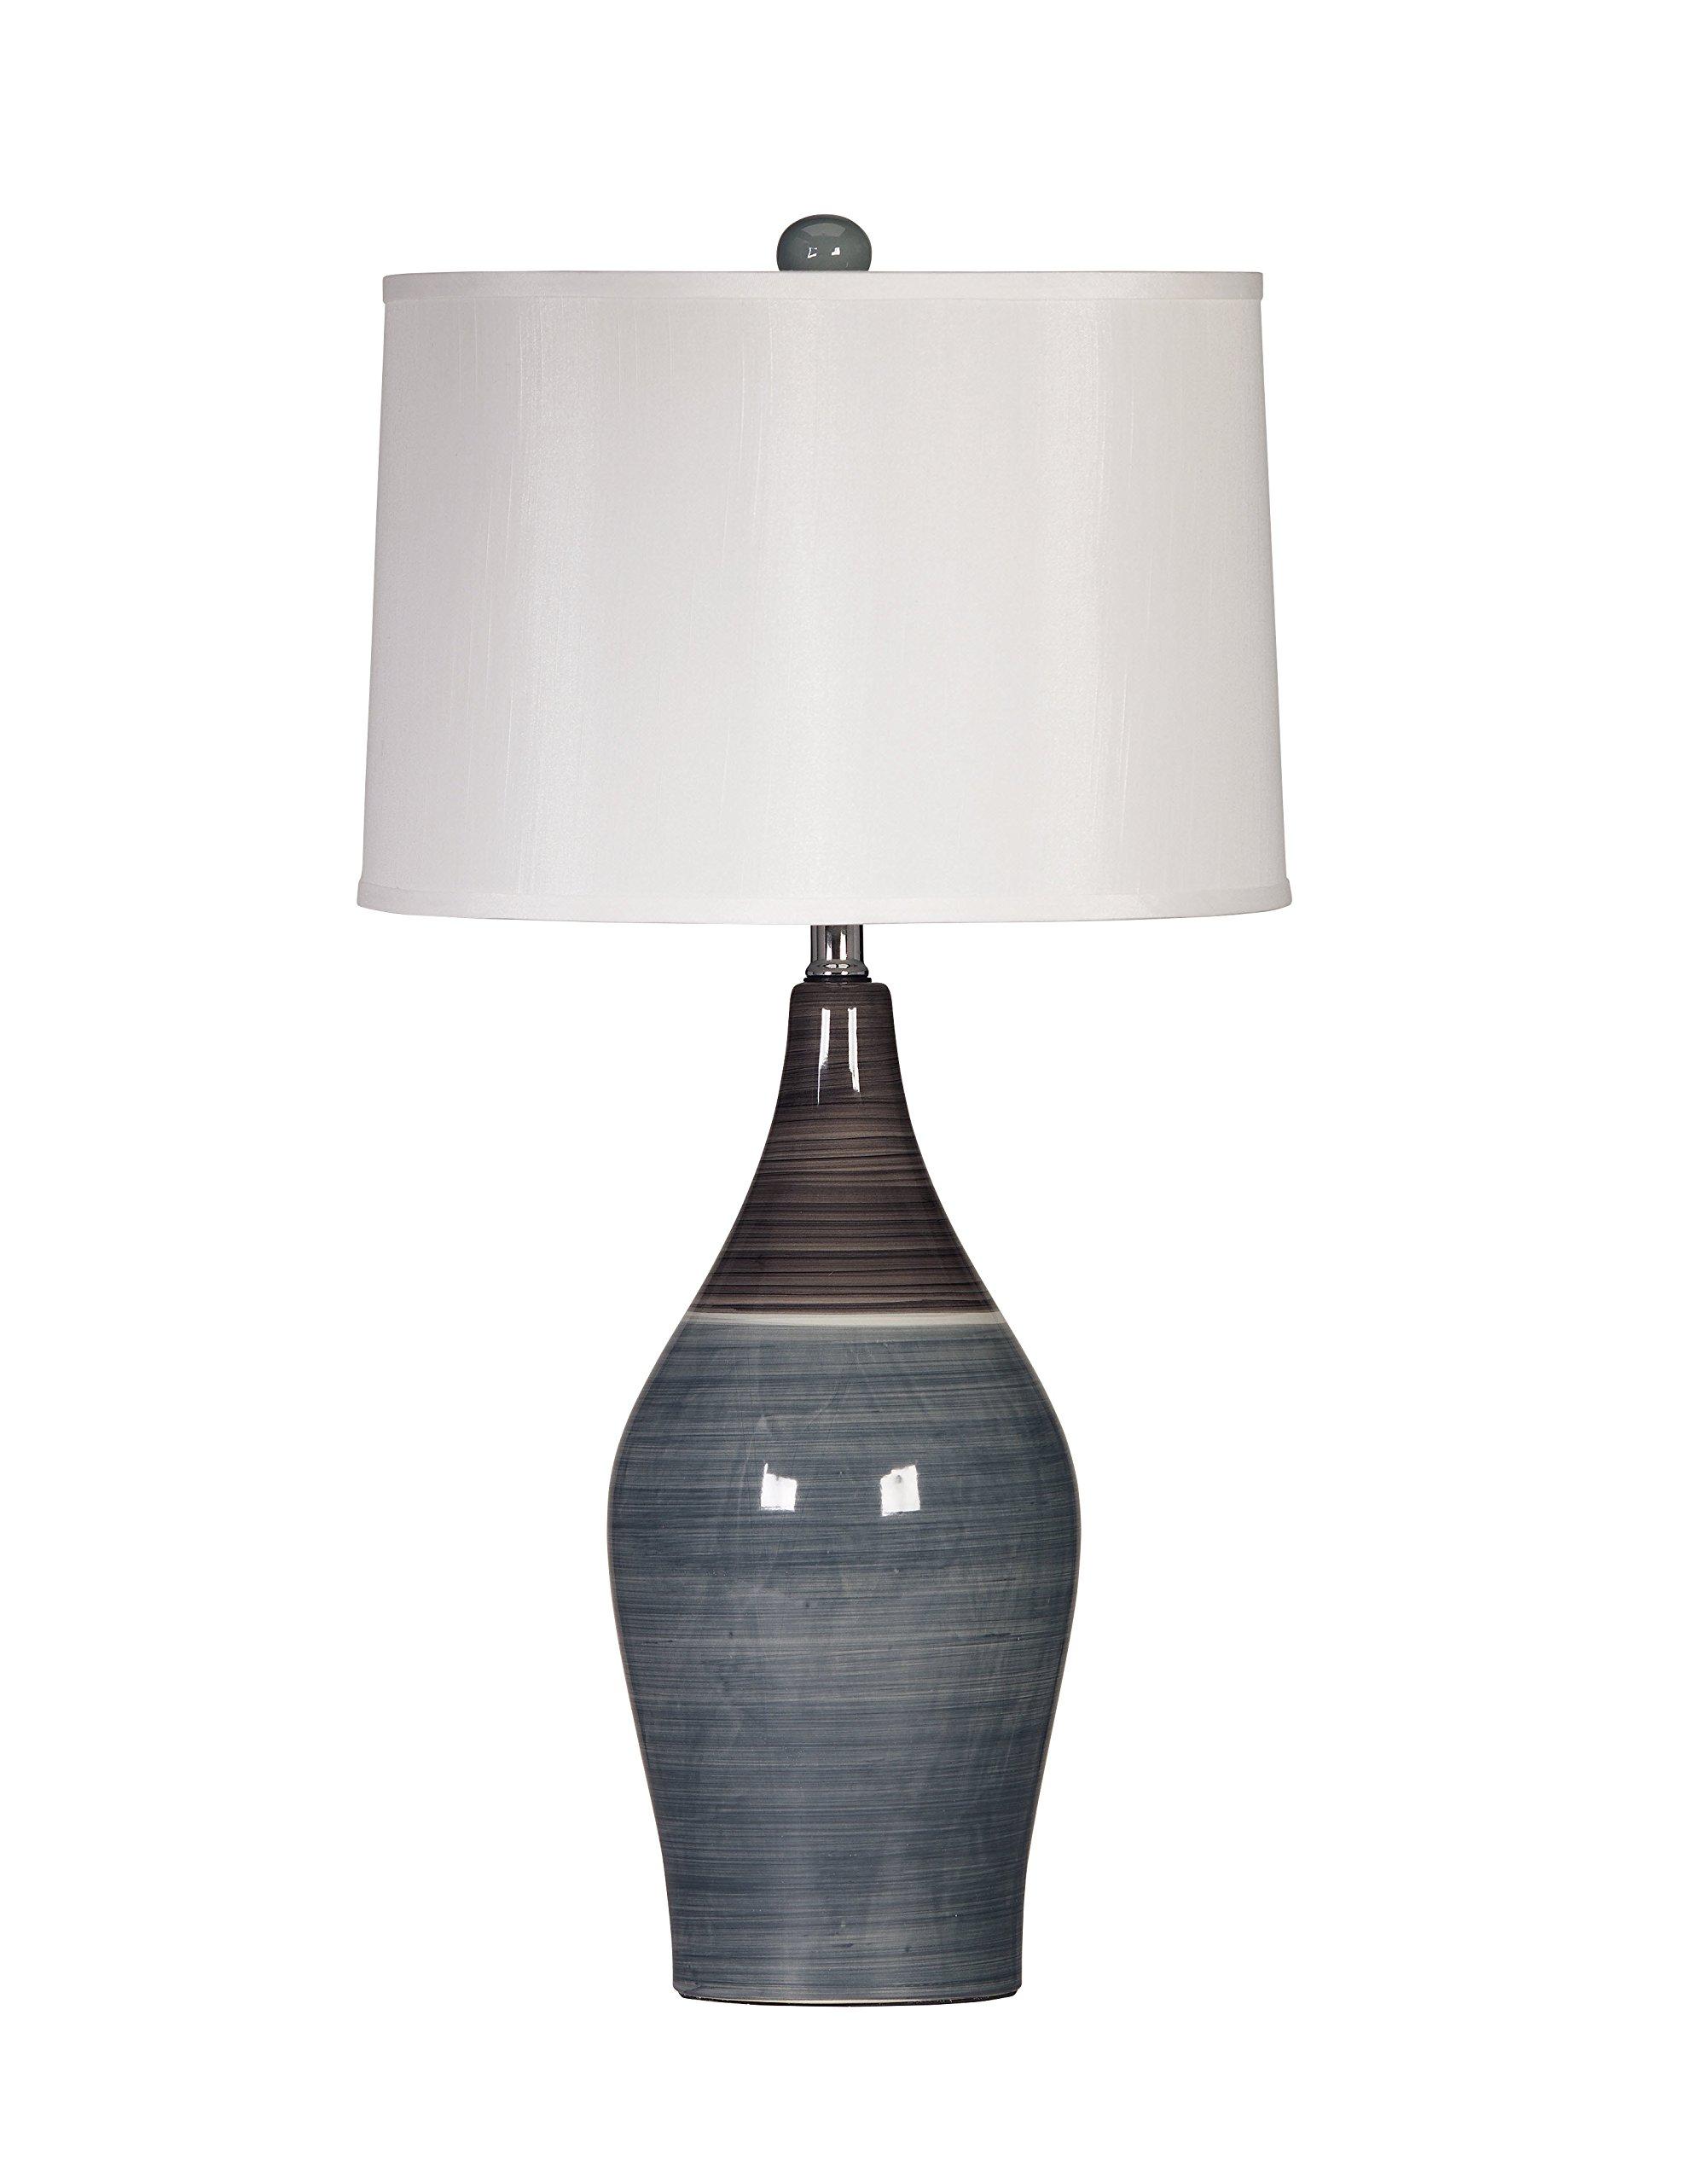 Ashley Furniture Signature Design - Niobe Ceramic Table Lamp - Set of 2 - Multicolored Gray by Signature Design by Ashley